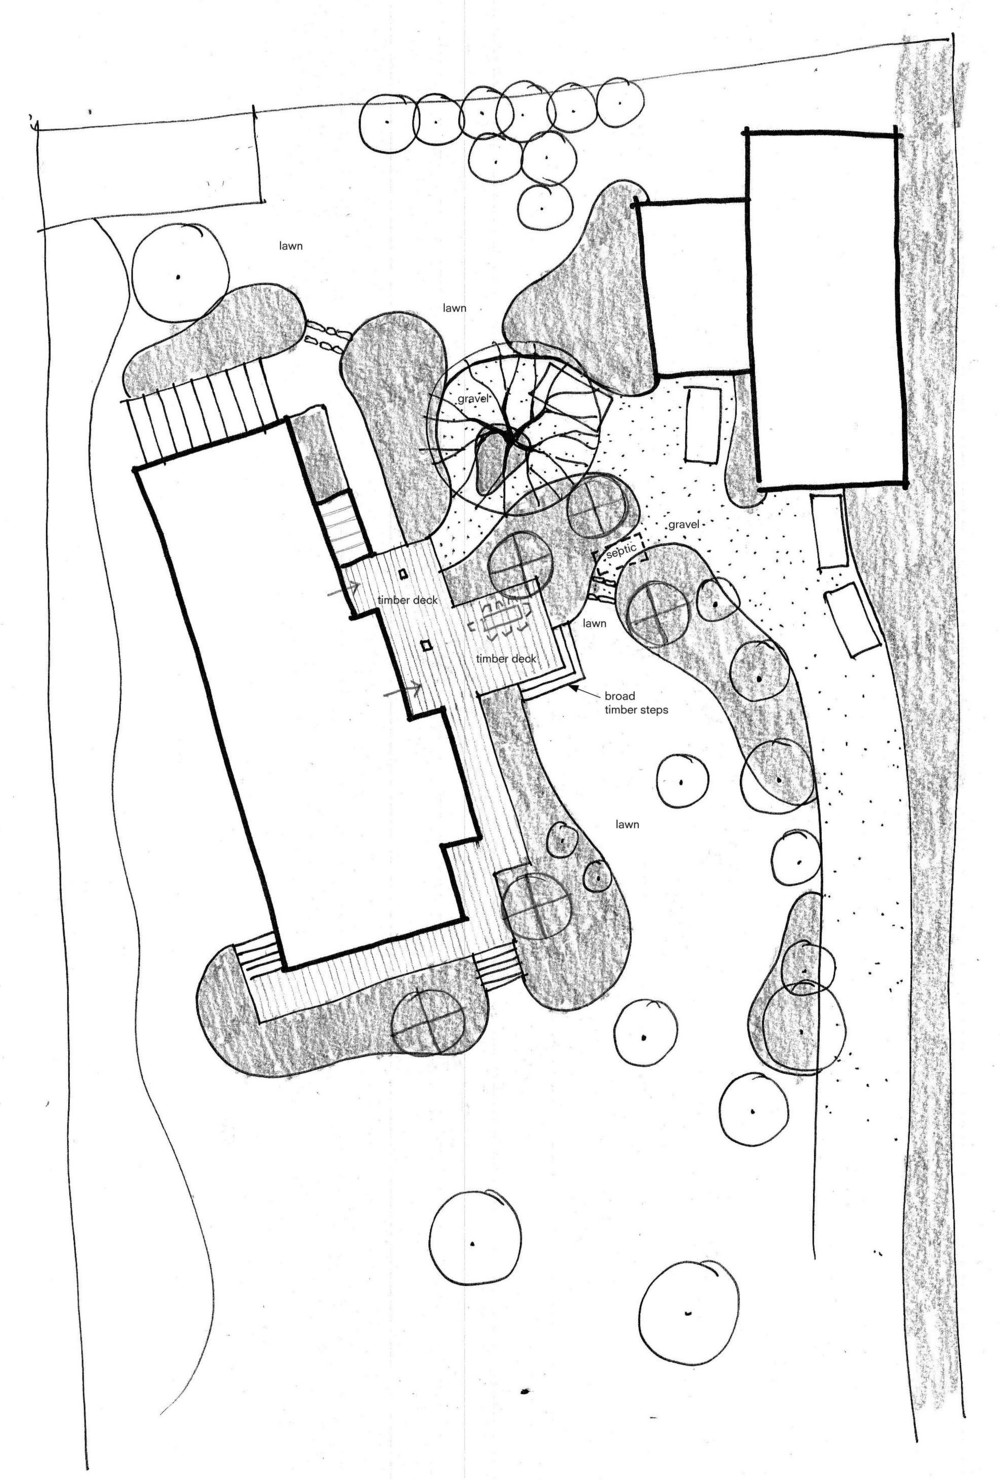 Ohaeawai plan 15 09 11.jpg